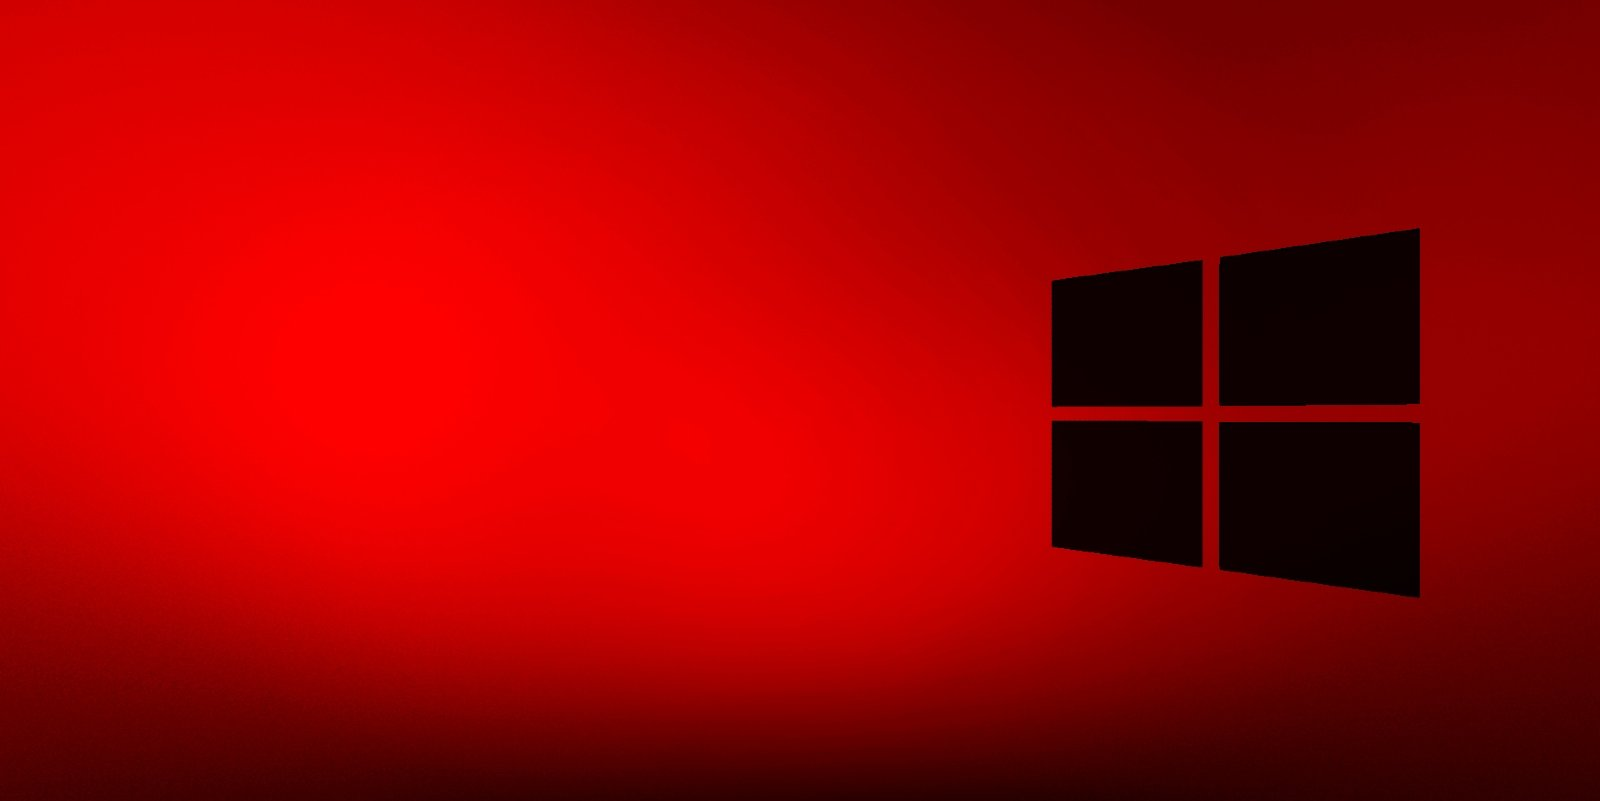 Google shares PoC exploit for critical Windows 10 Graphics RCE bug